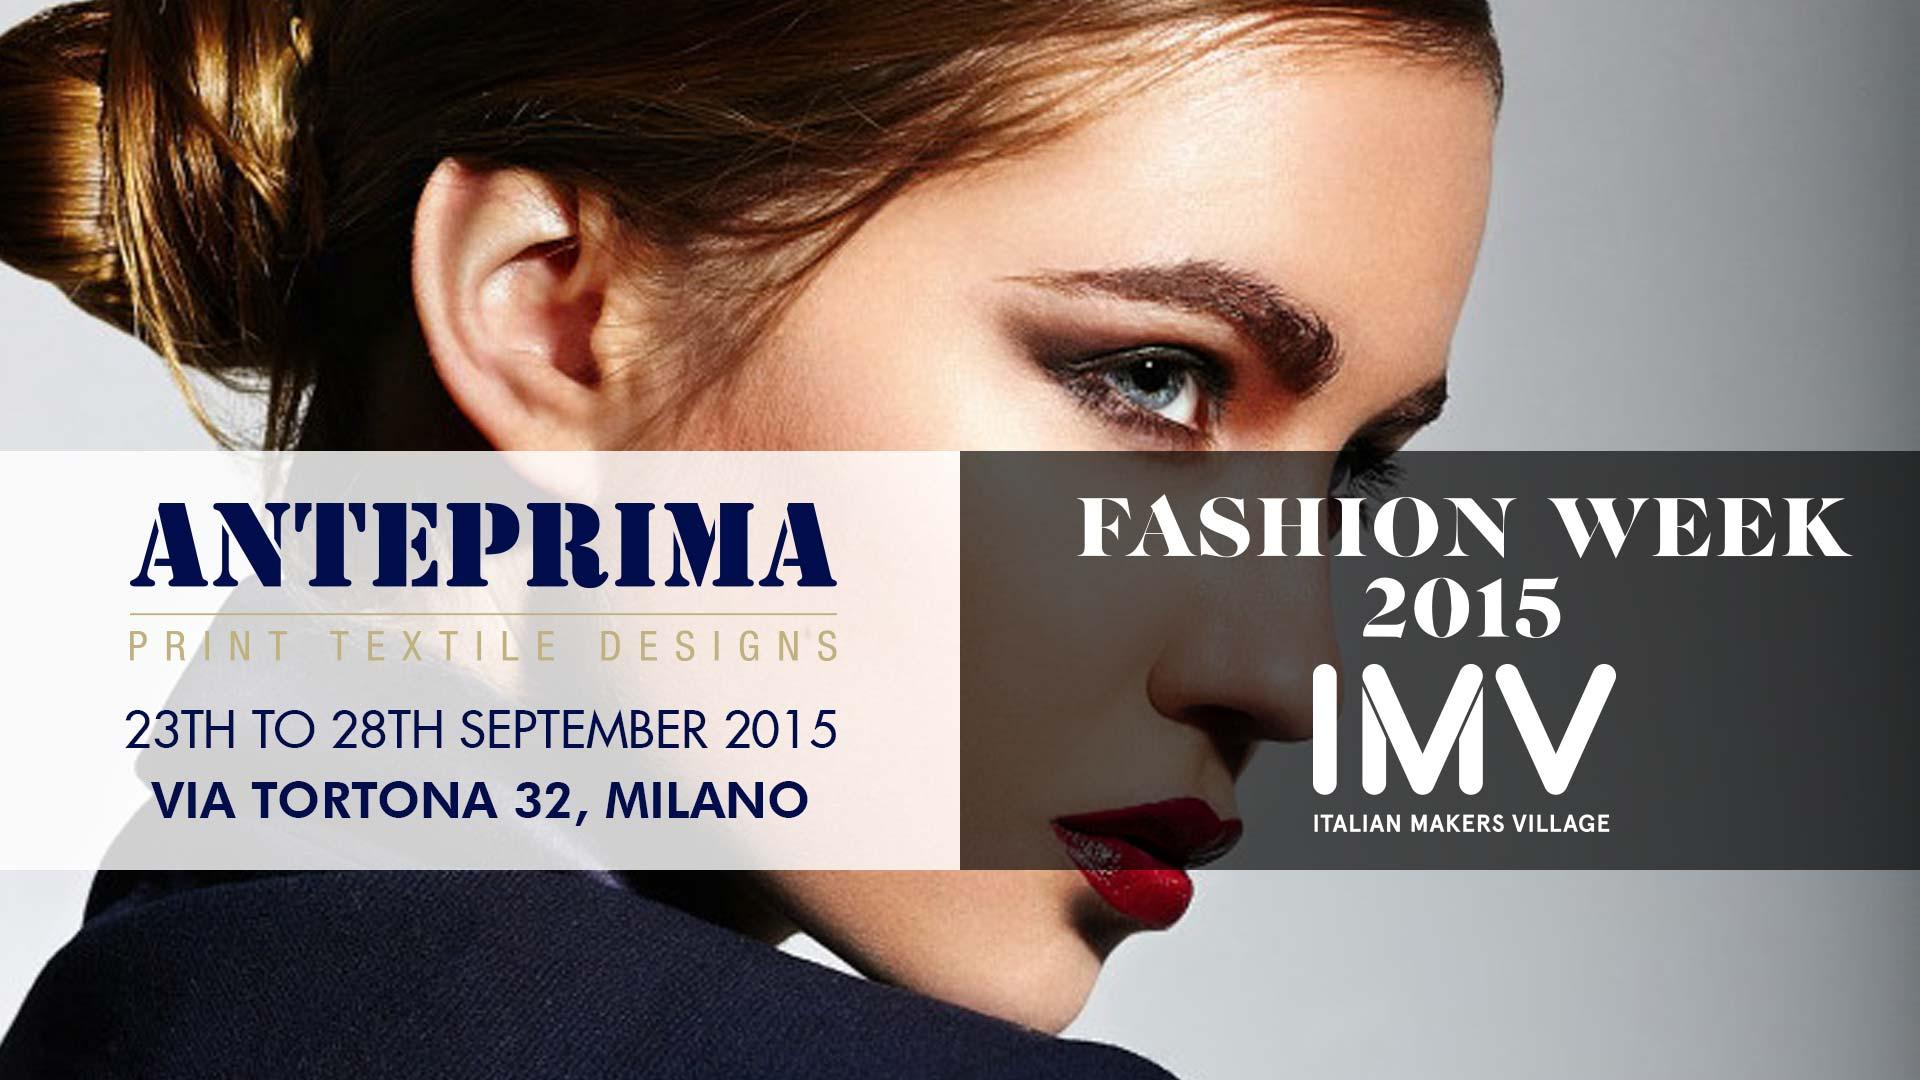 Anteprima @ Milano Fashion Week 2015